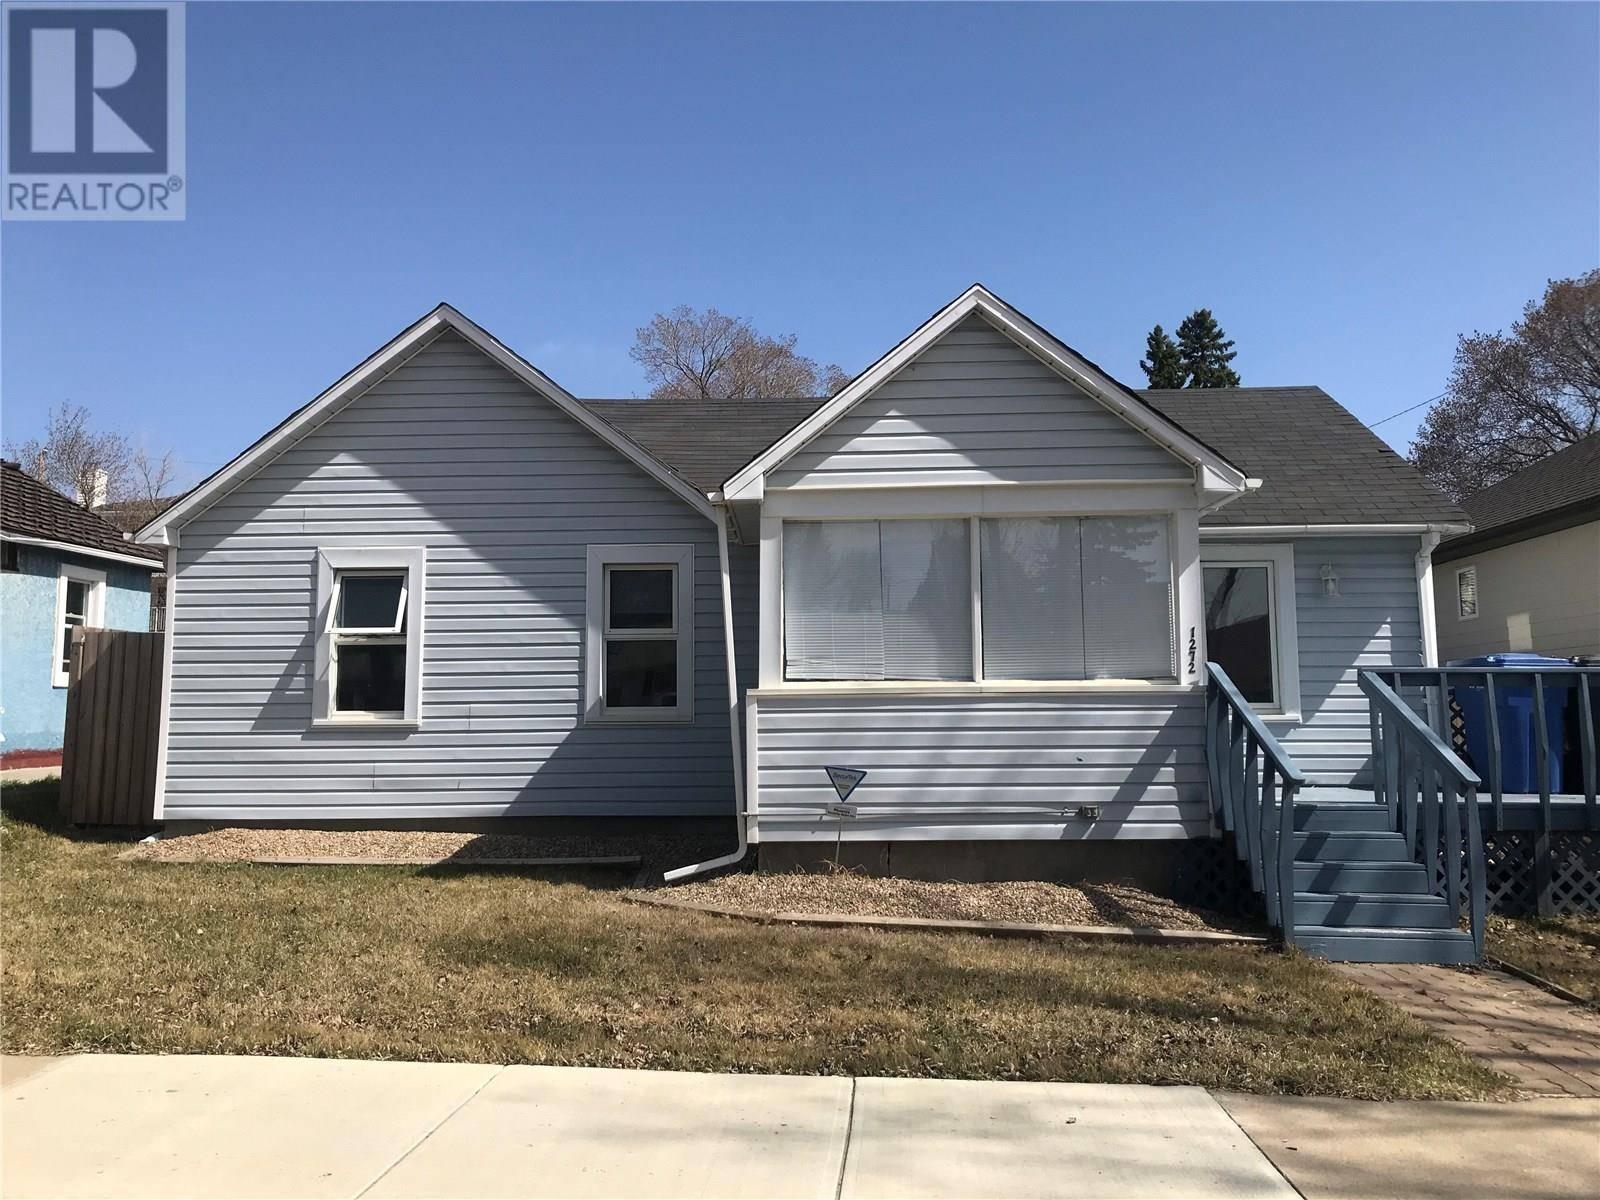 House for sale at 1272 96th St North Battleford Saskatchewan - MLS: SK758652